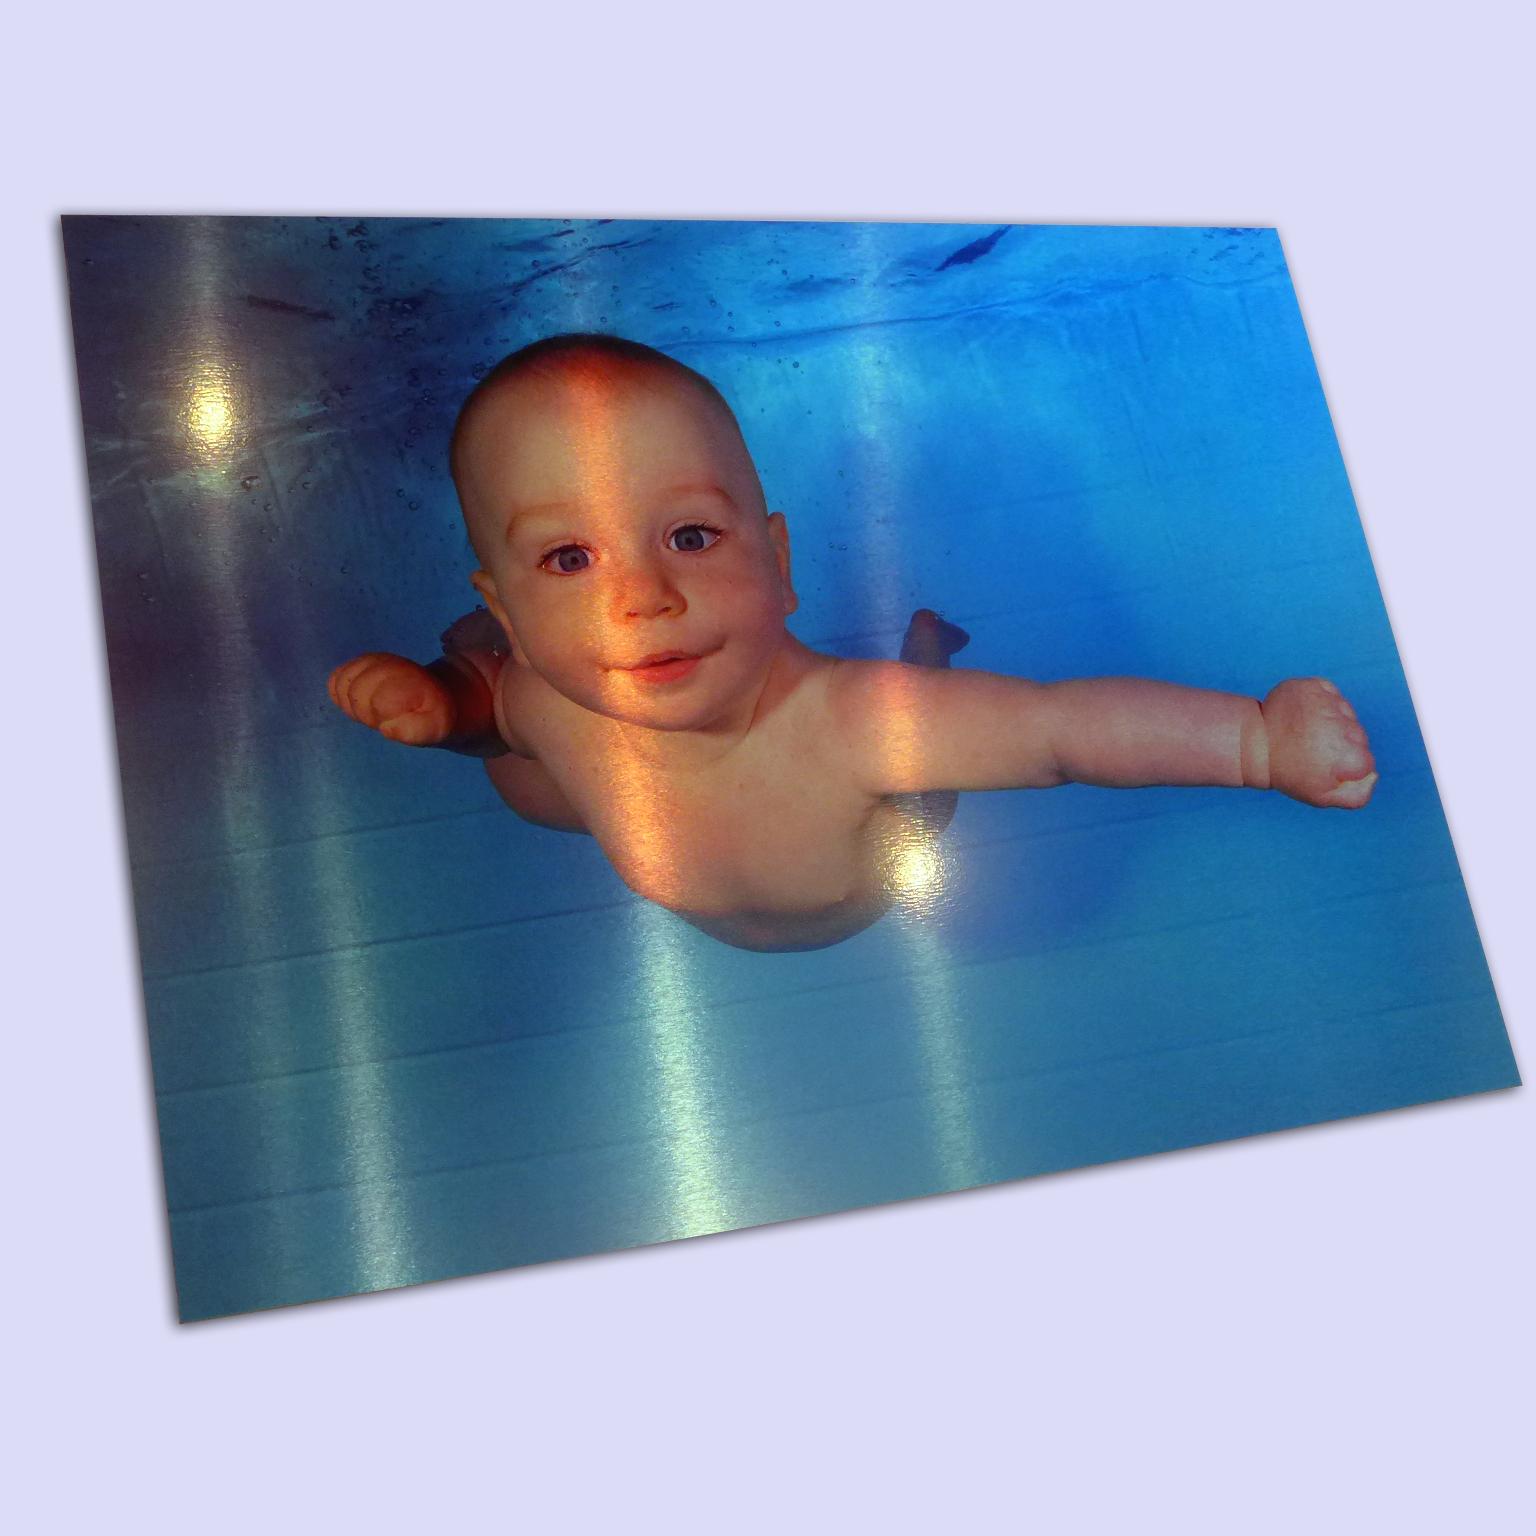 Family photos printed onto metal